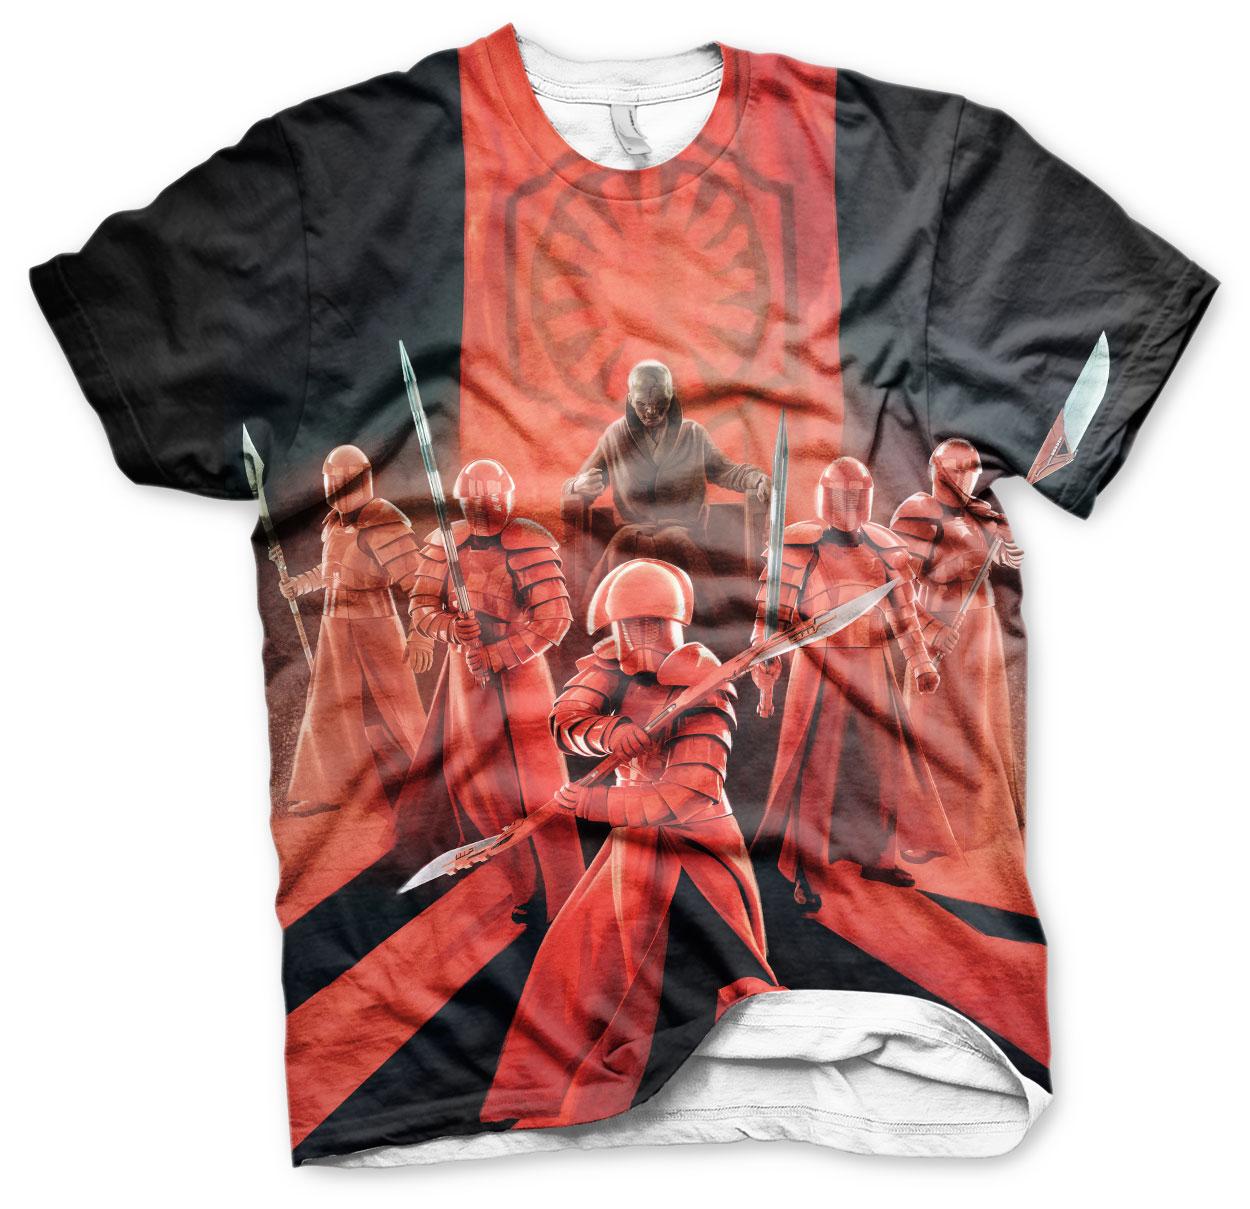 Snoke's Praetorian Guards Allover T-Shirt